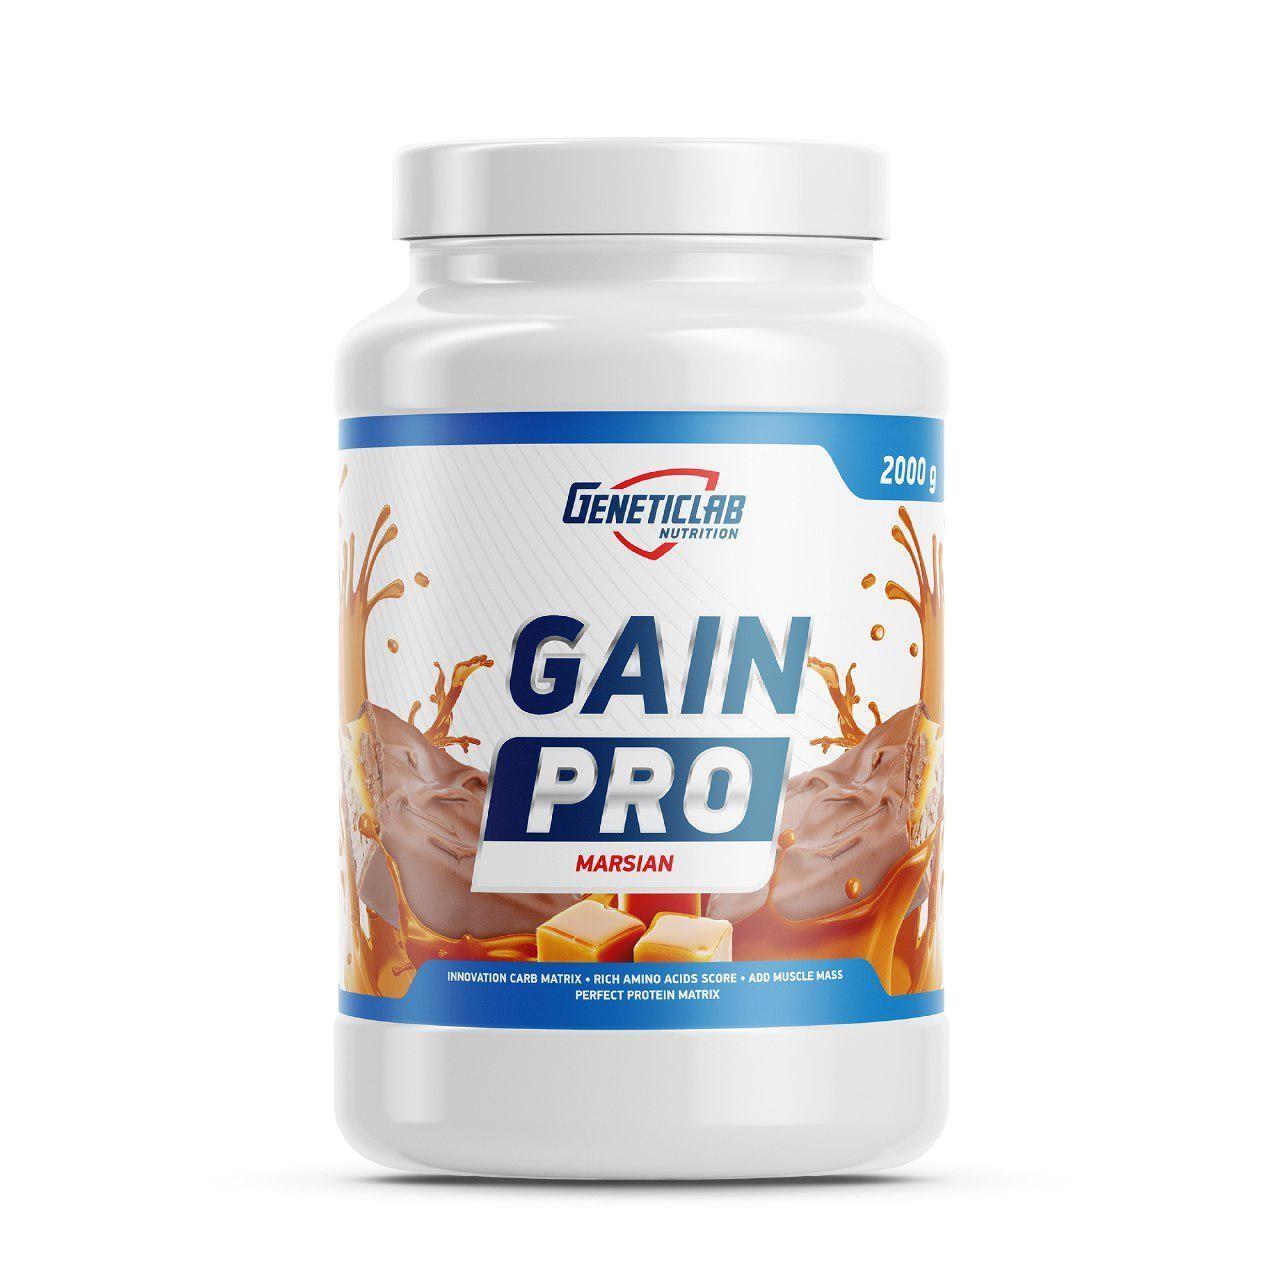 Geneticlab GAIN PRO 2000гр. 30% белка